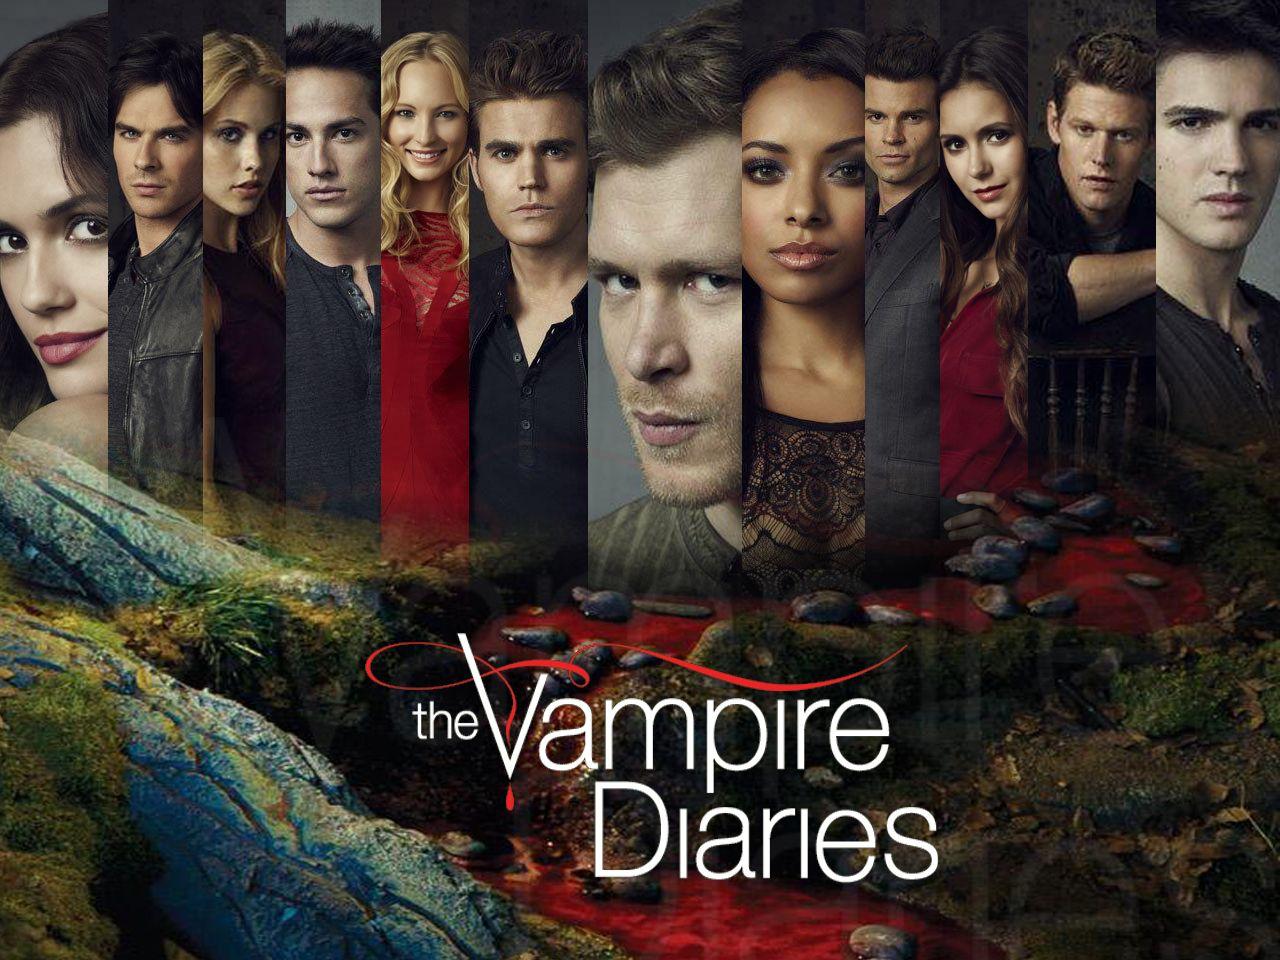 The Vampire Diaries Season 1 Posters Poster Nao Oficial Da 4ª